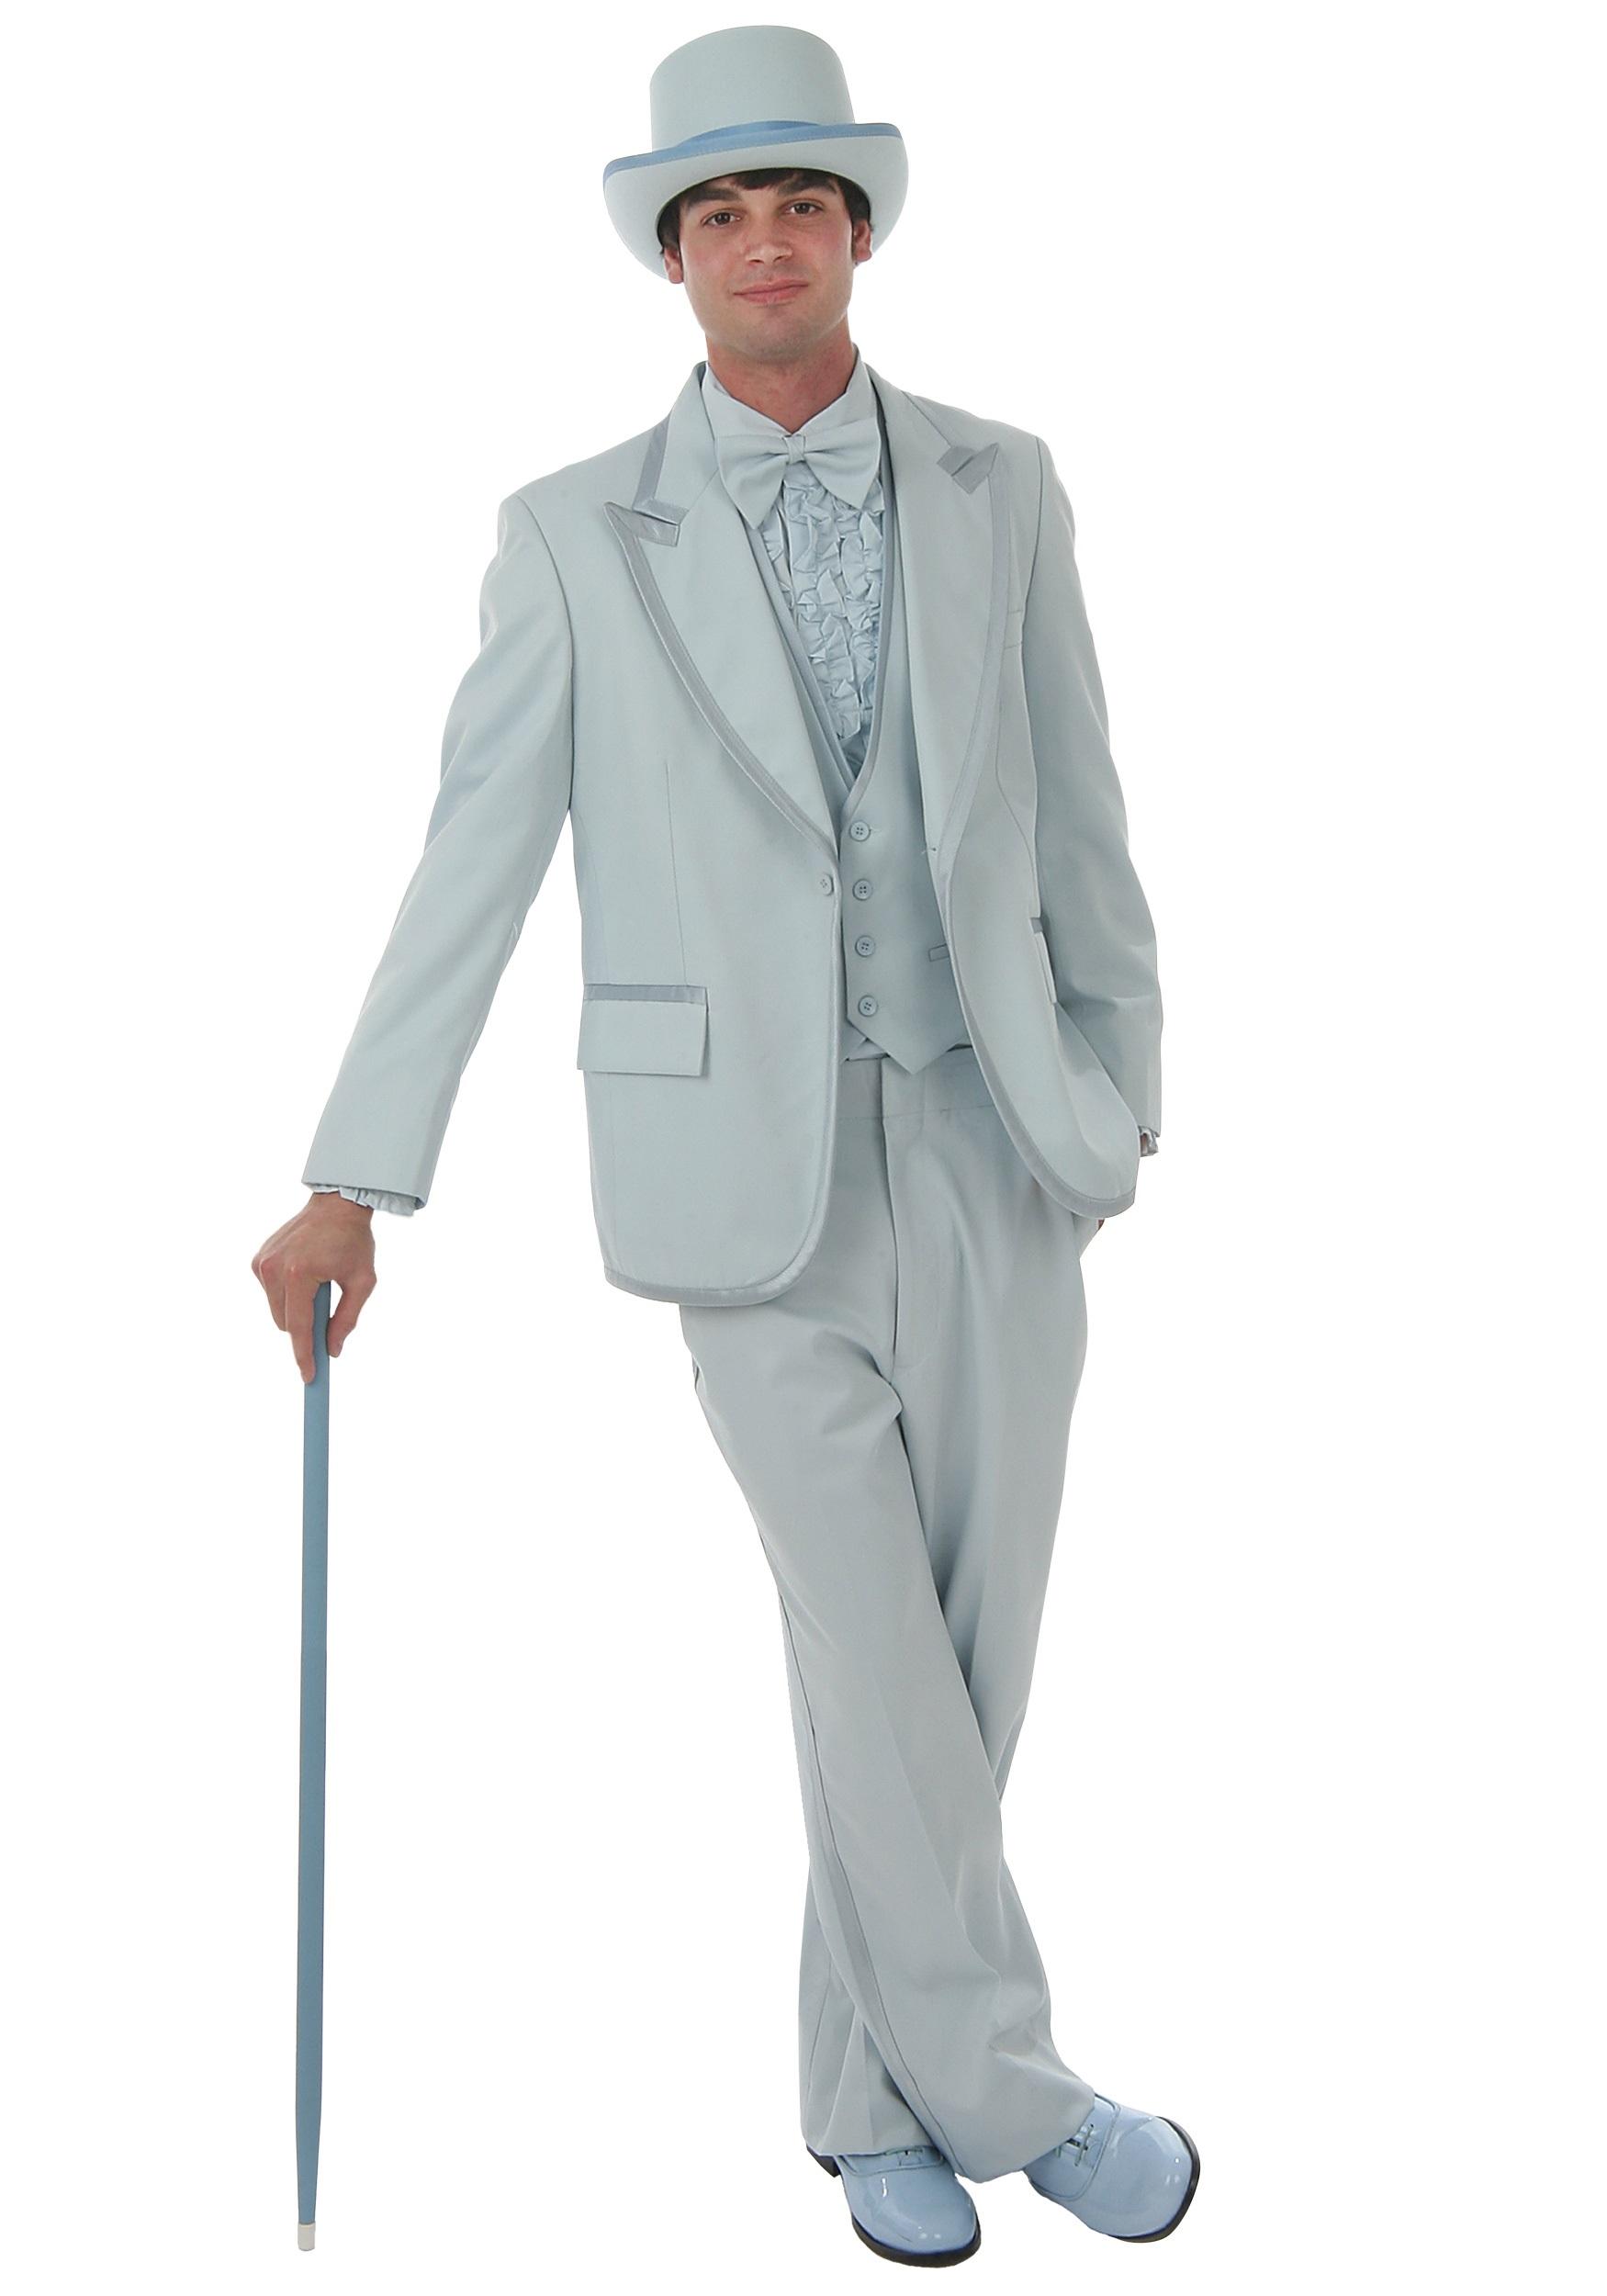 Tuxedo Costumes - Colorful Adult Tuxedo Costumes